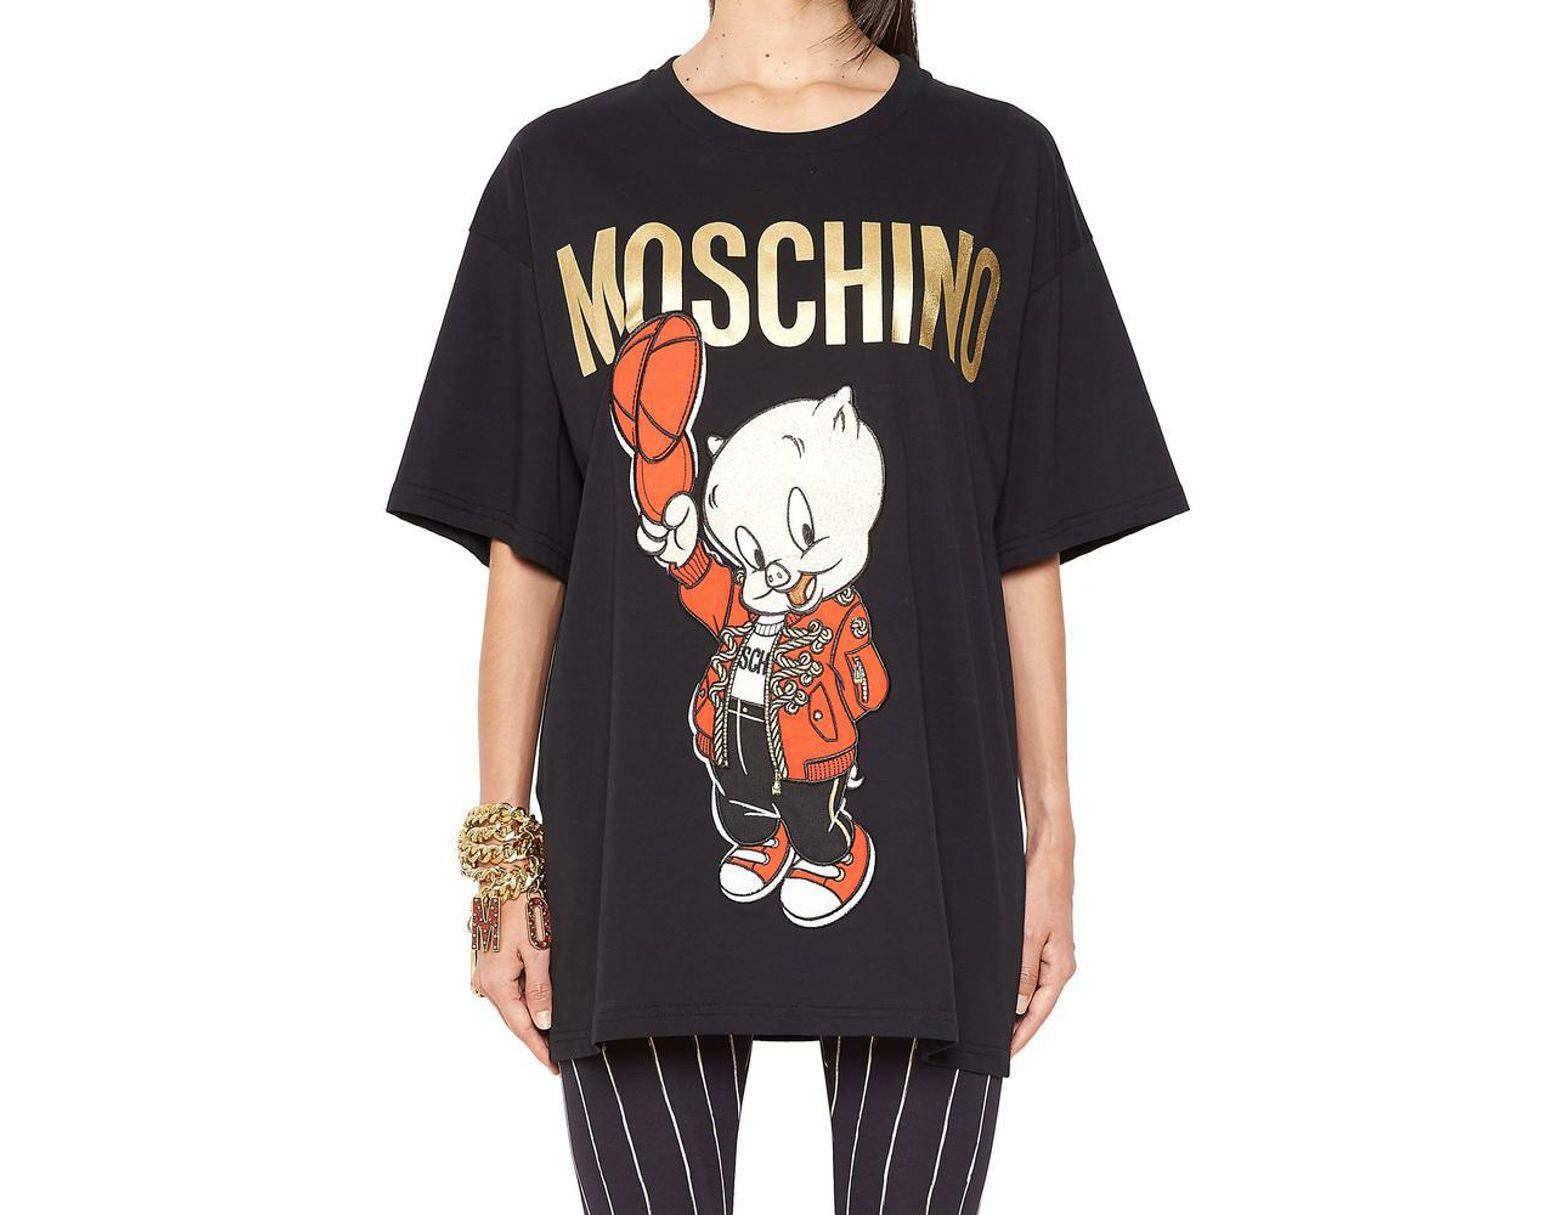 b383450755f Moschino Pig Logo T-shirt in Black - Lyst